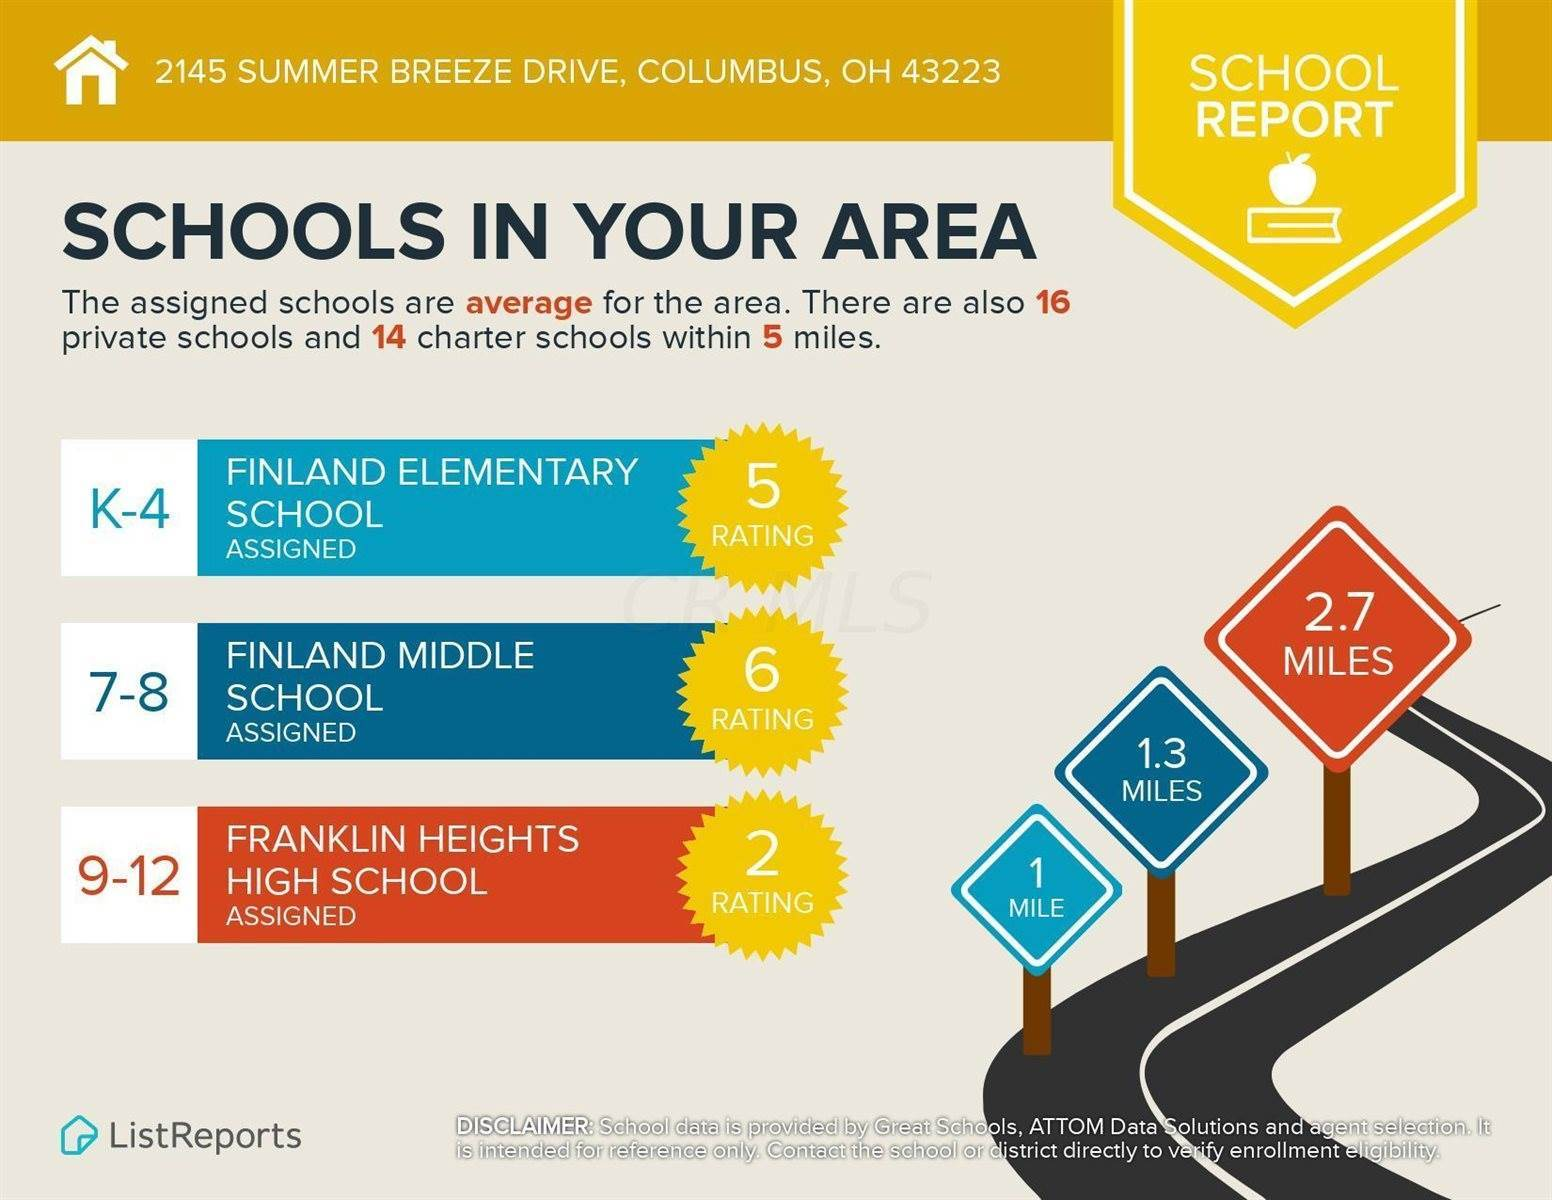 2145 Summer Breeze Drive, Columbus, OH 43223